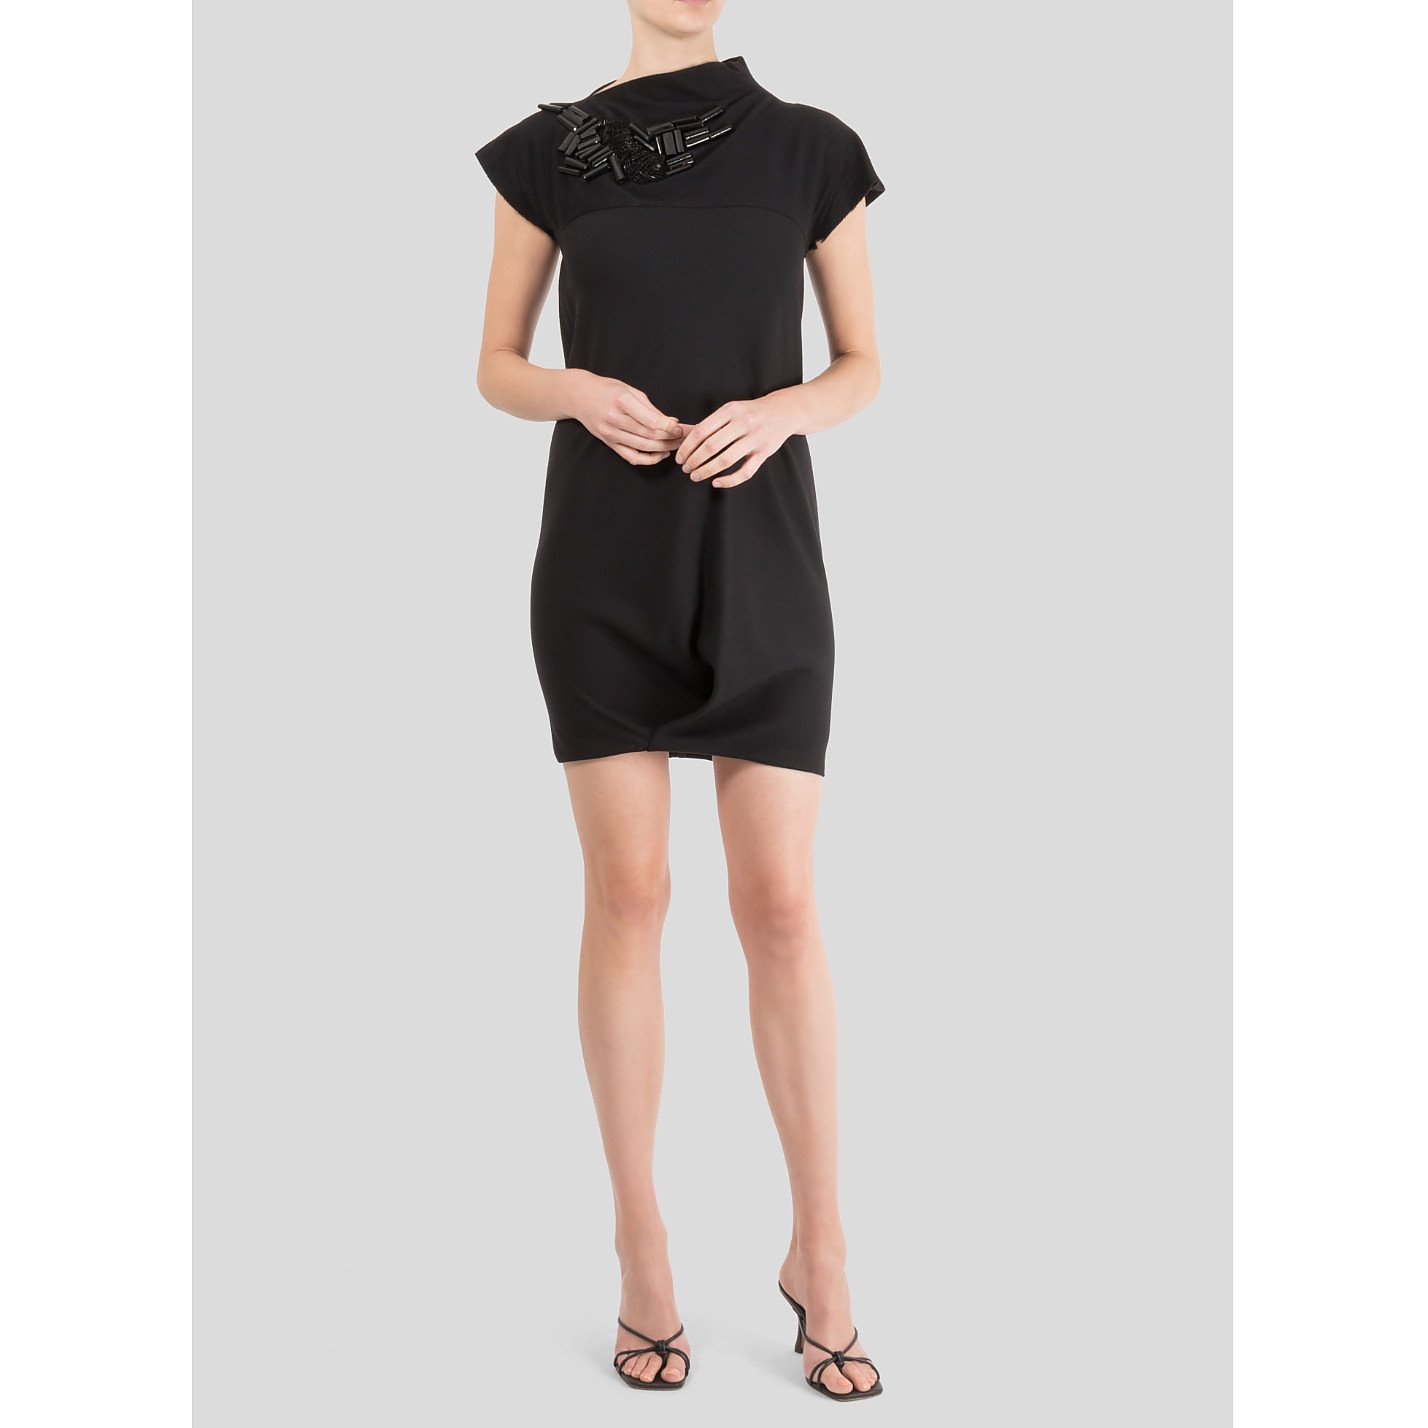 Victoria Beckham Mini Dress With Neckline Embroidery